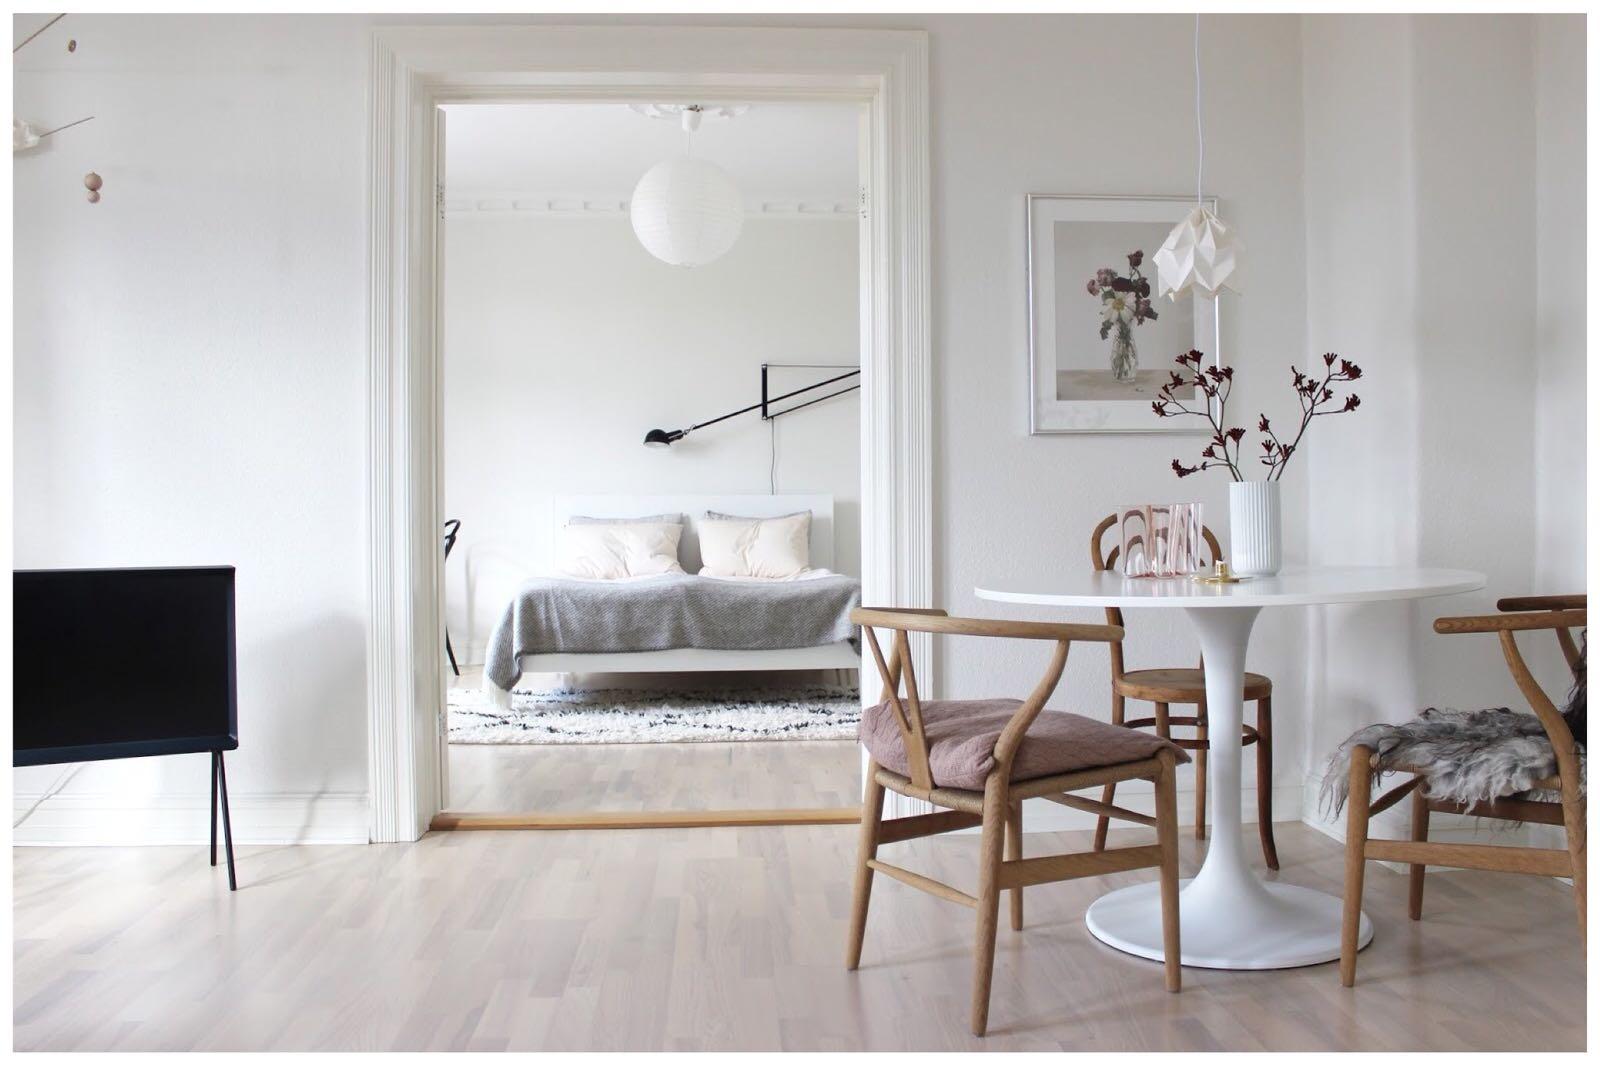 Arredamento Cucina Stile Nordico stile scandinavo: elementi caratteristici - blog casaomnia